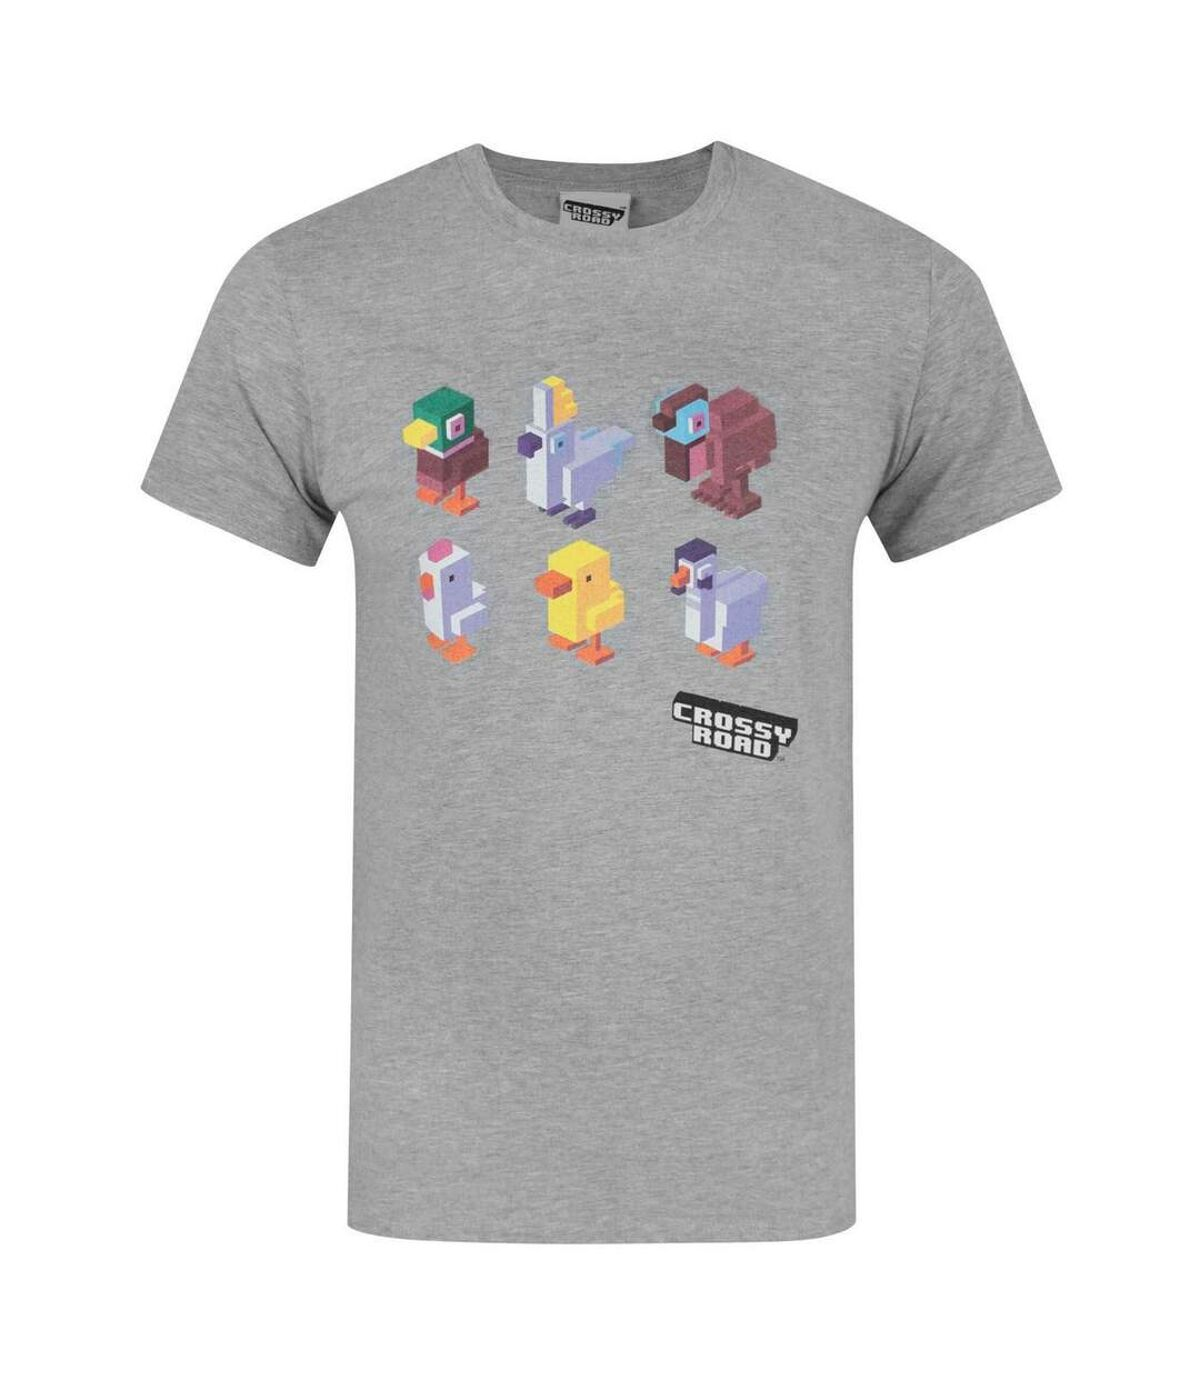 Crossy Road Mens Official Character Design T-Shirt (Light Grey) - UTNS126